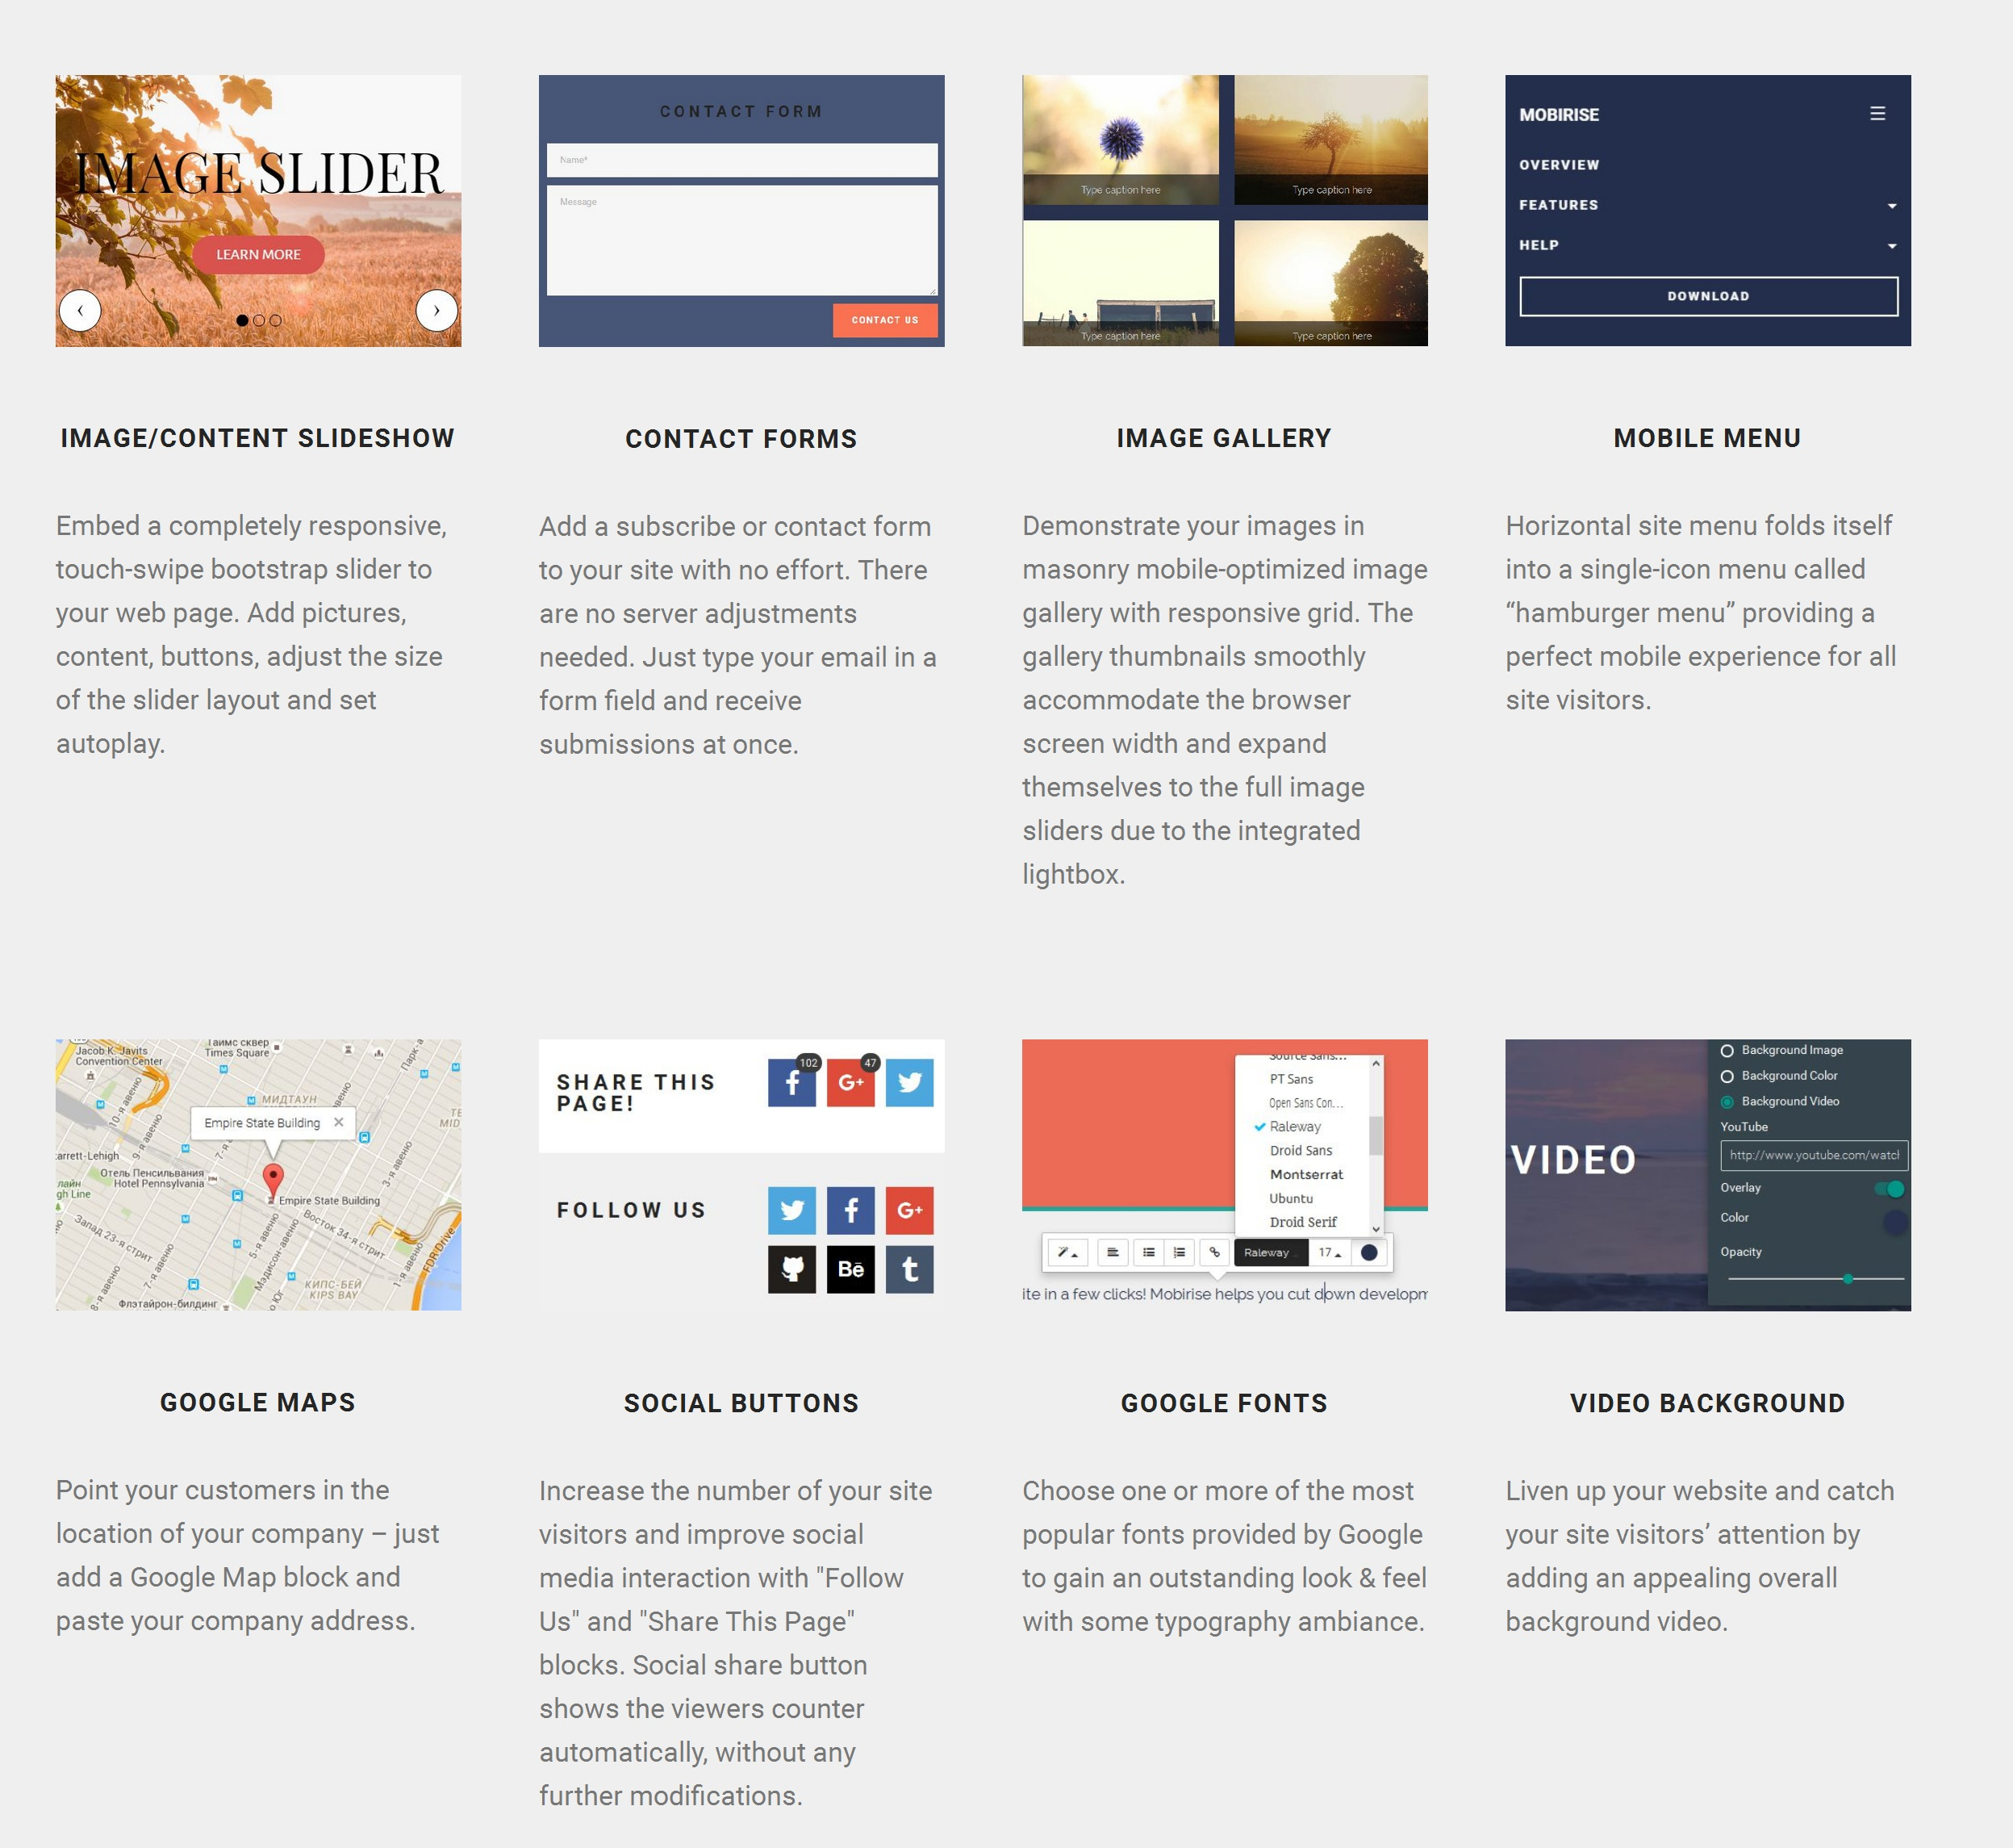 Best WYSIWYG Web Page  Creator Software